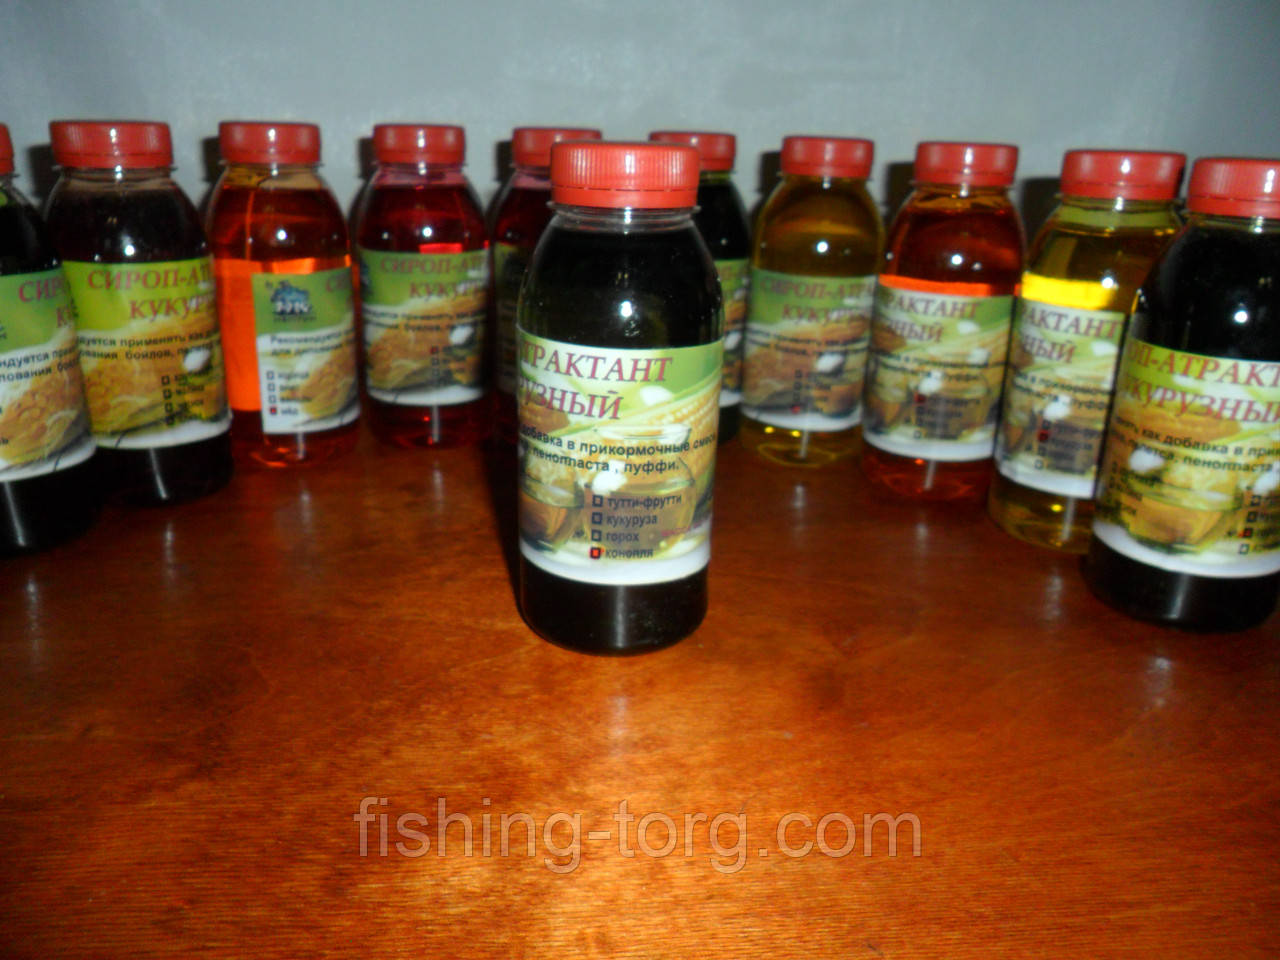 сироп антрактант кукурузный конопля  440 гр